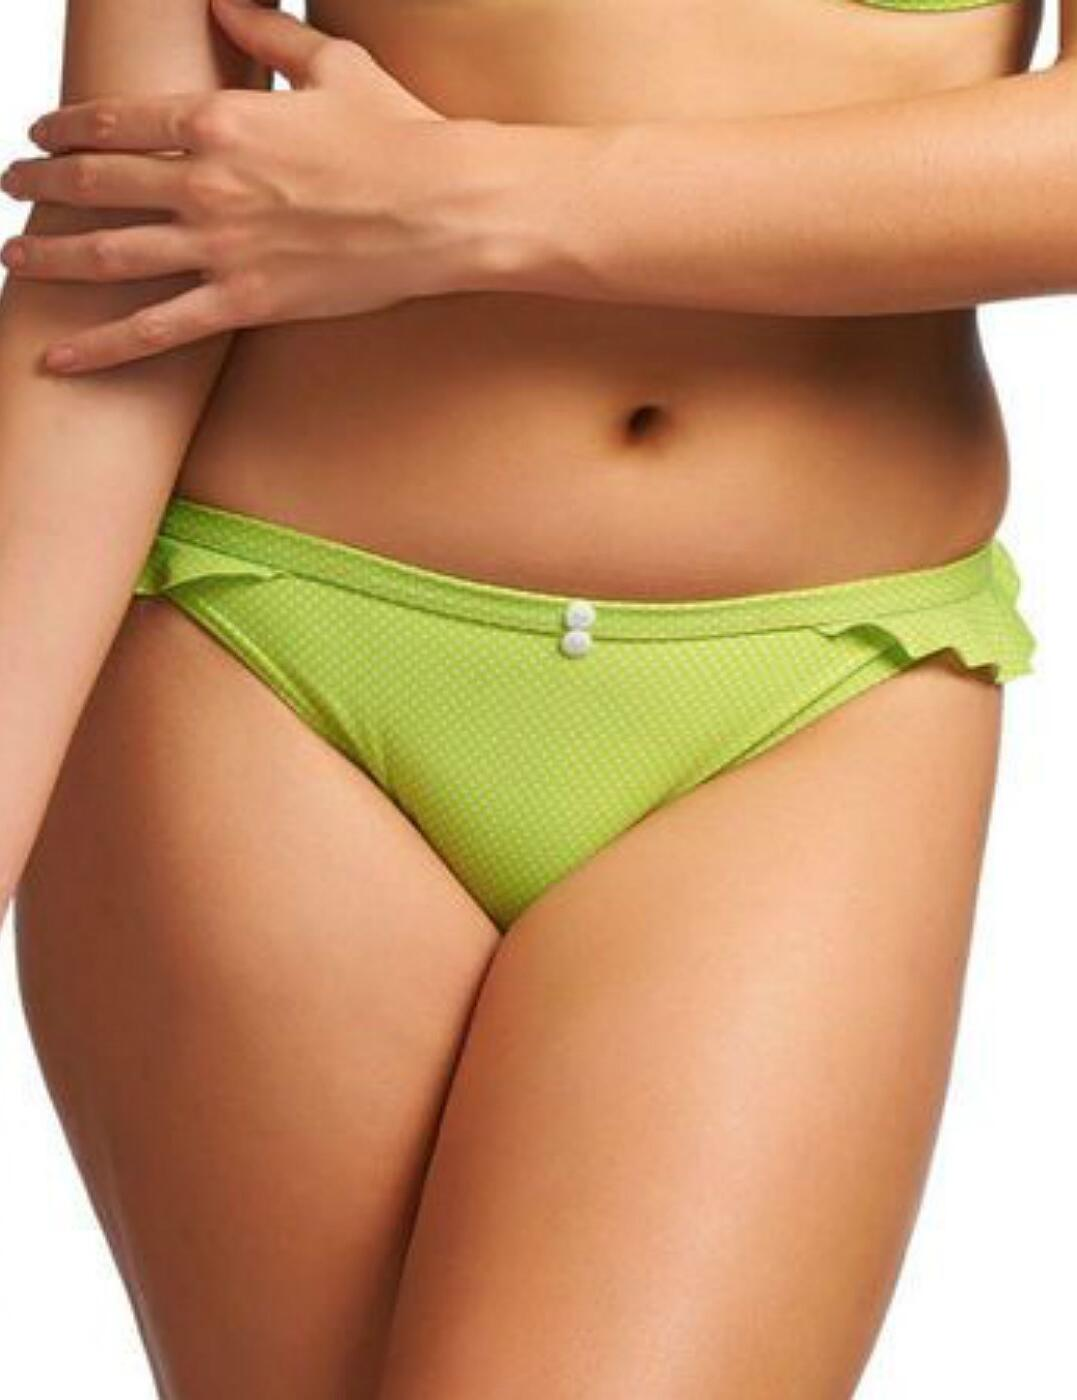 7612b982c6 Freya Cherish Rio Bikini Brief - Belle Lingerie